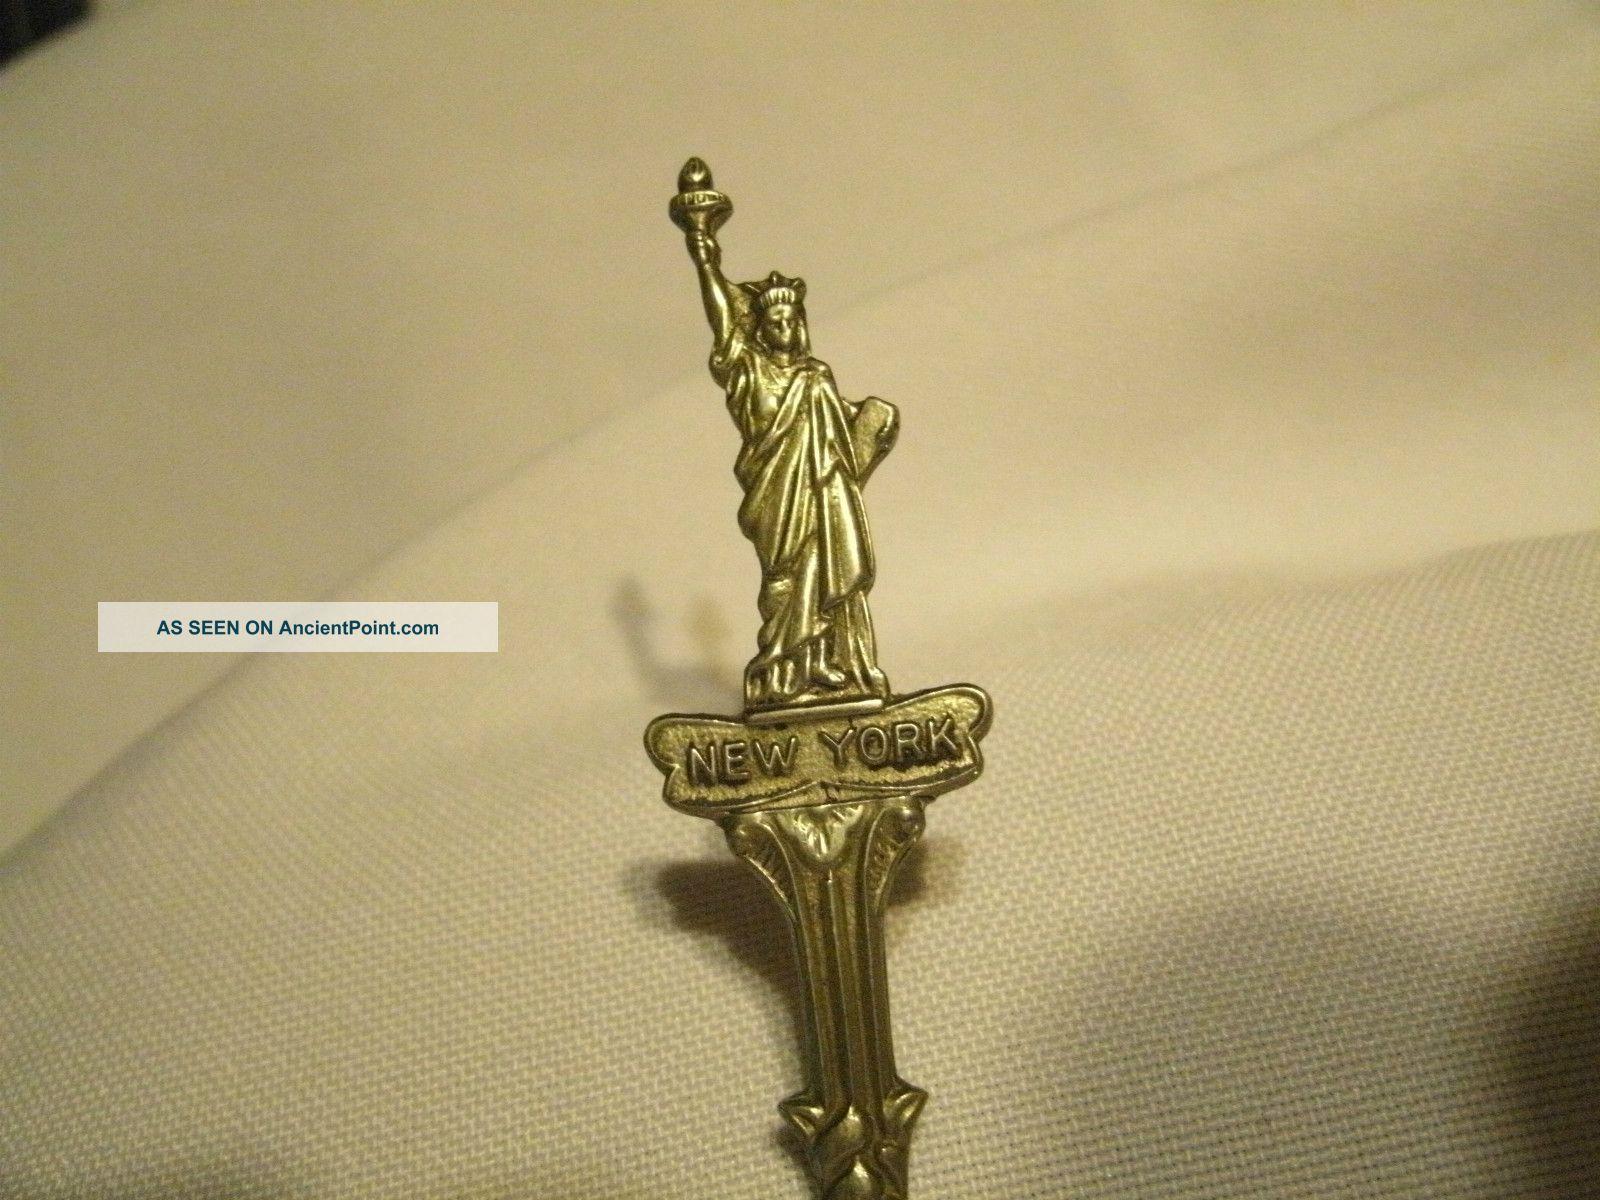 Vintage Silver Plated Spoon Souvenir Rare Statue Of Liberty New York Blue Delft Souvenir Spoons photo